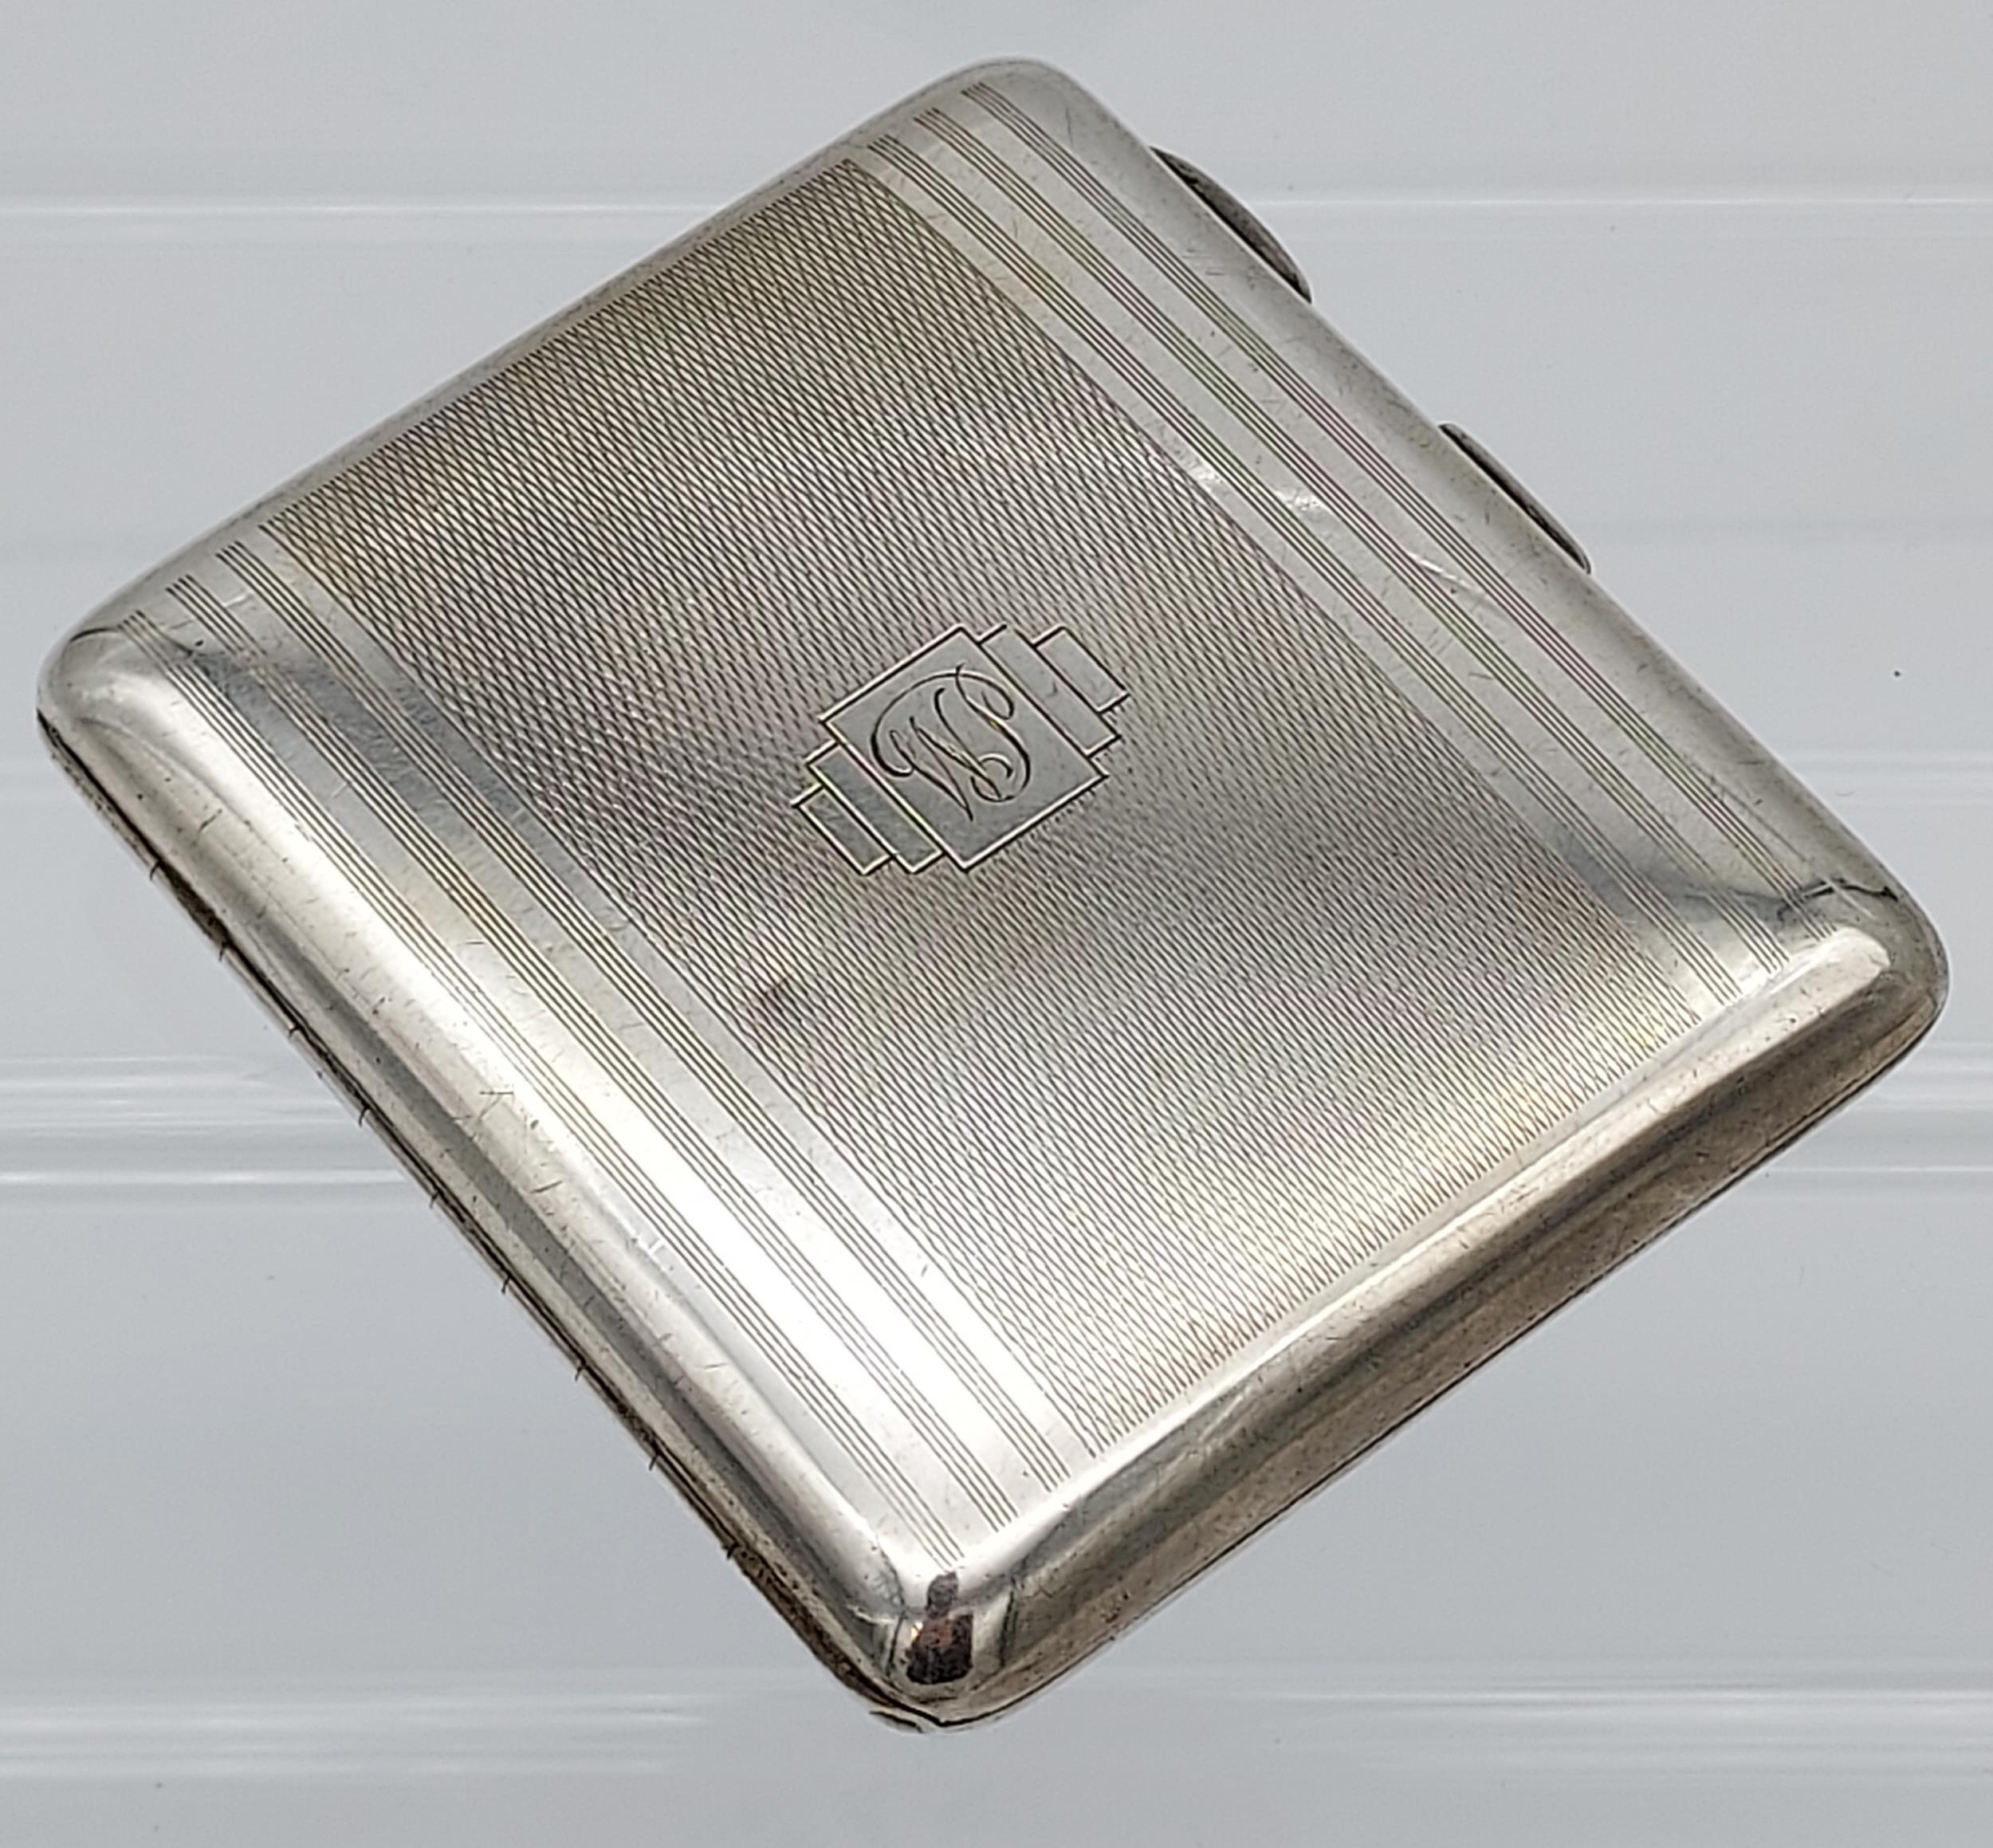 A Birmingham silver Art Deco design cigarette case [99.96grams] - Image 2 of 5